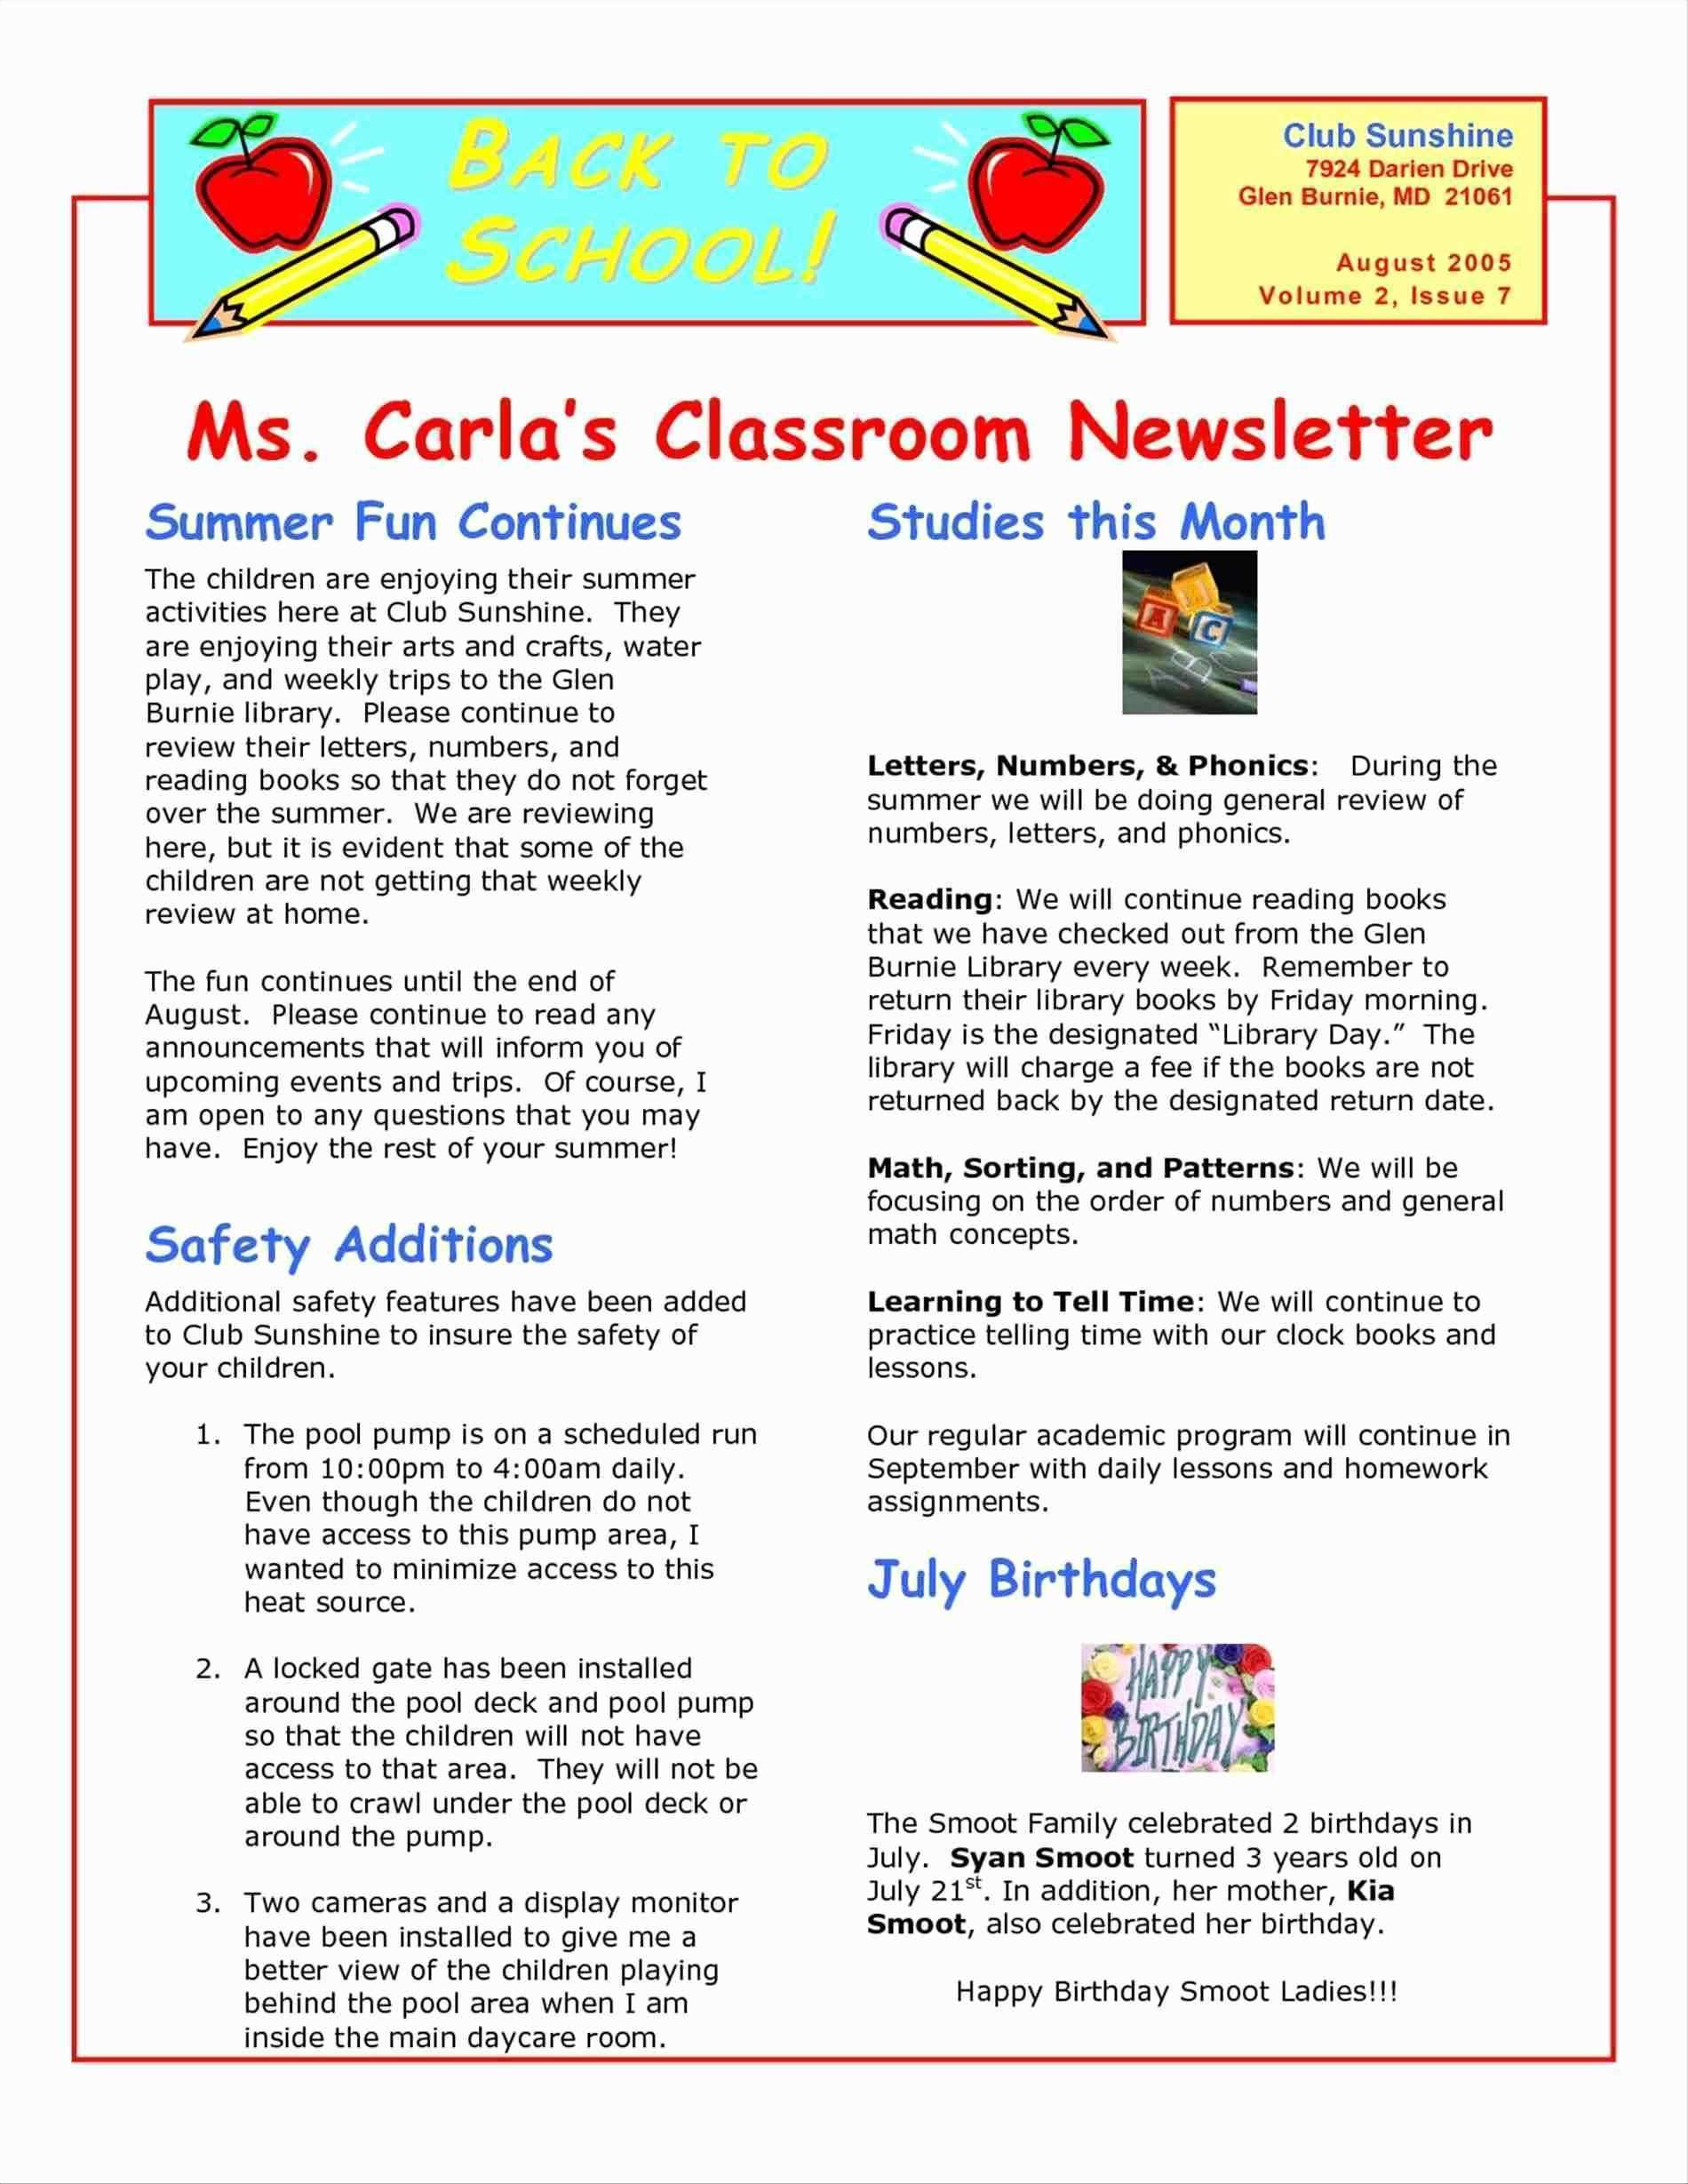 School Newsletter Templates Word